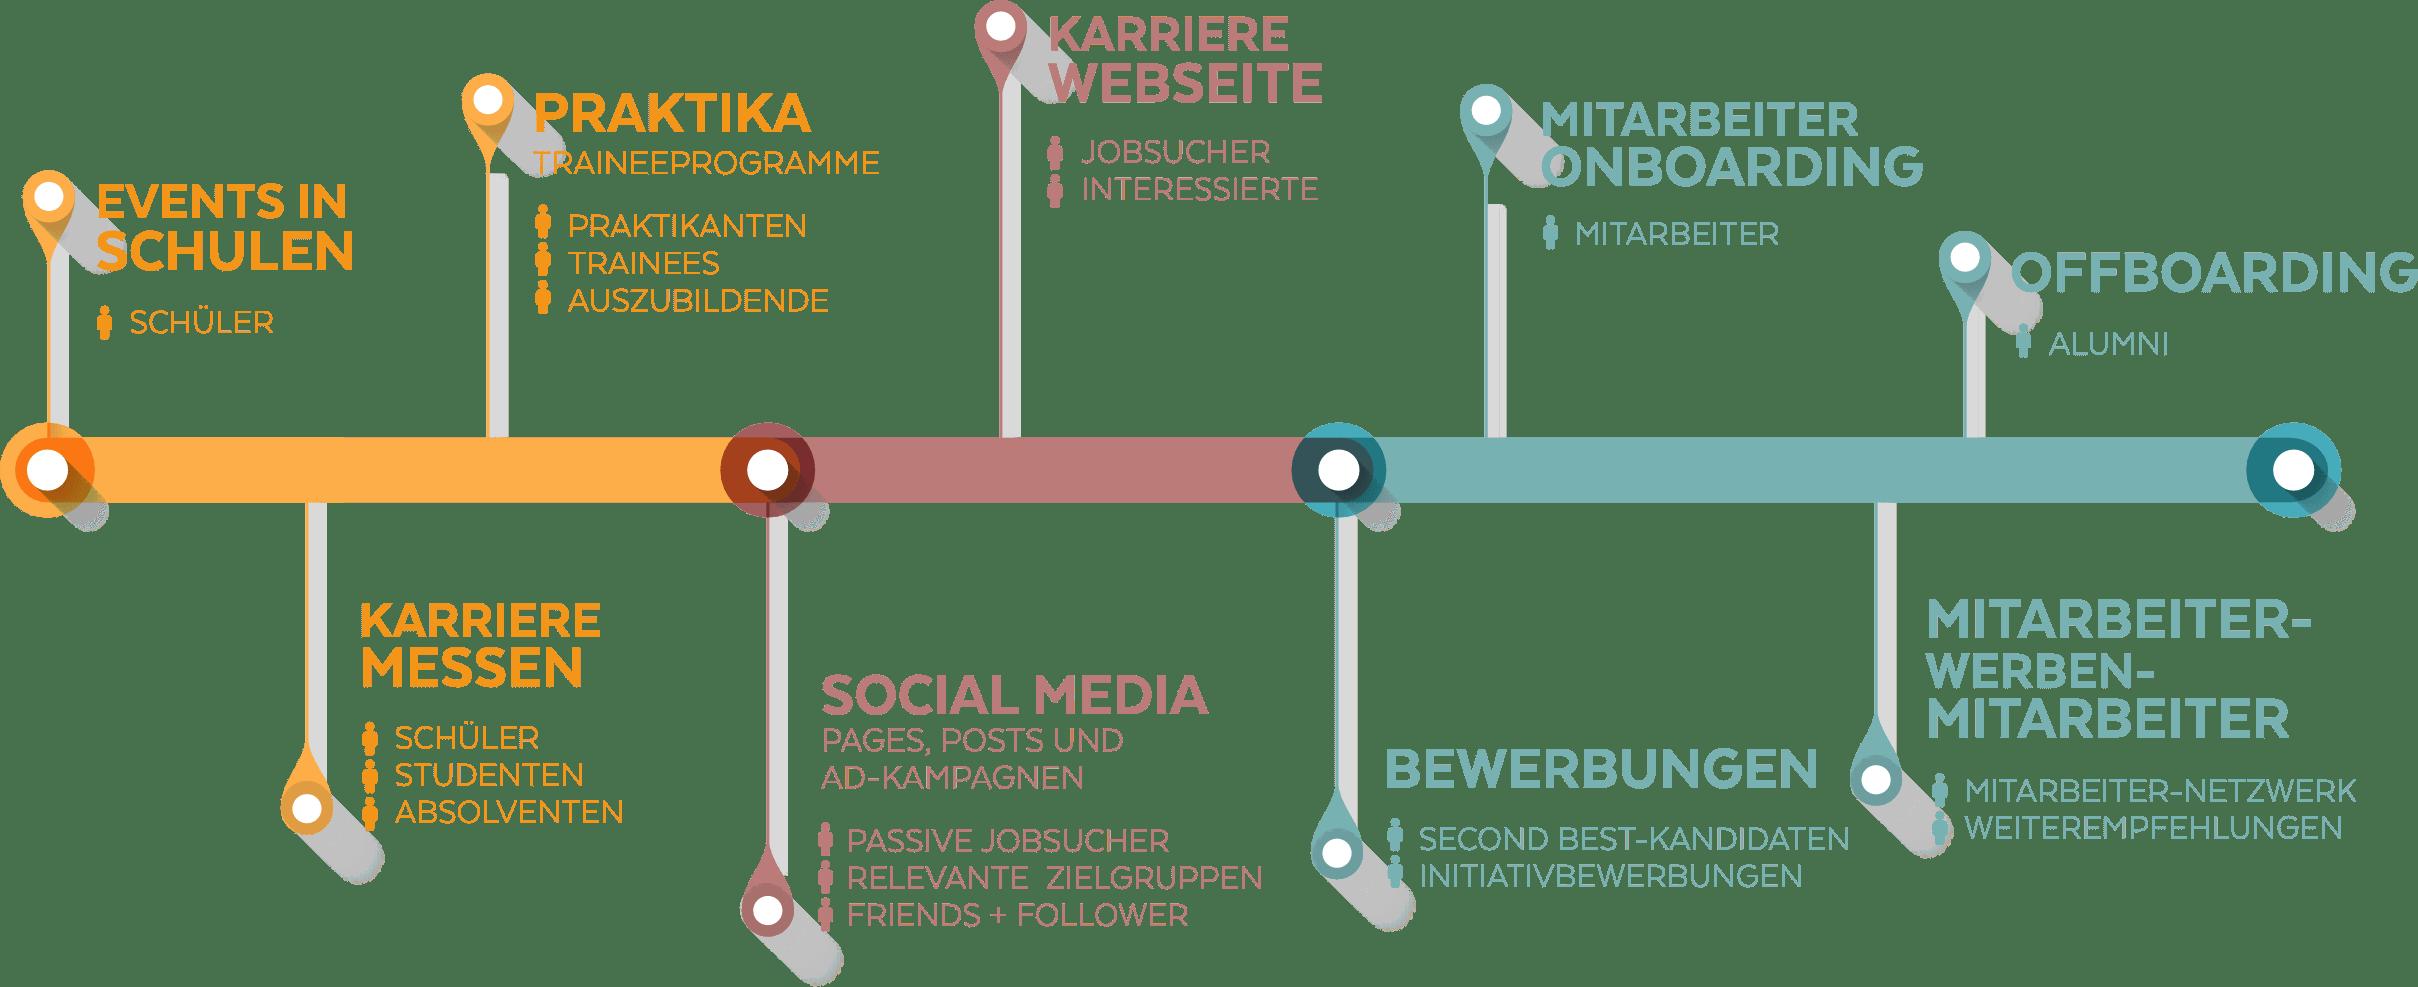 myVeeta Talent Map Overview